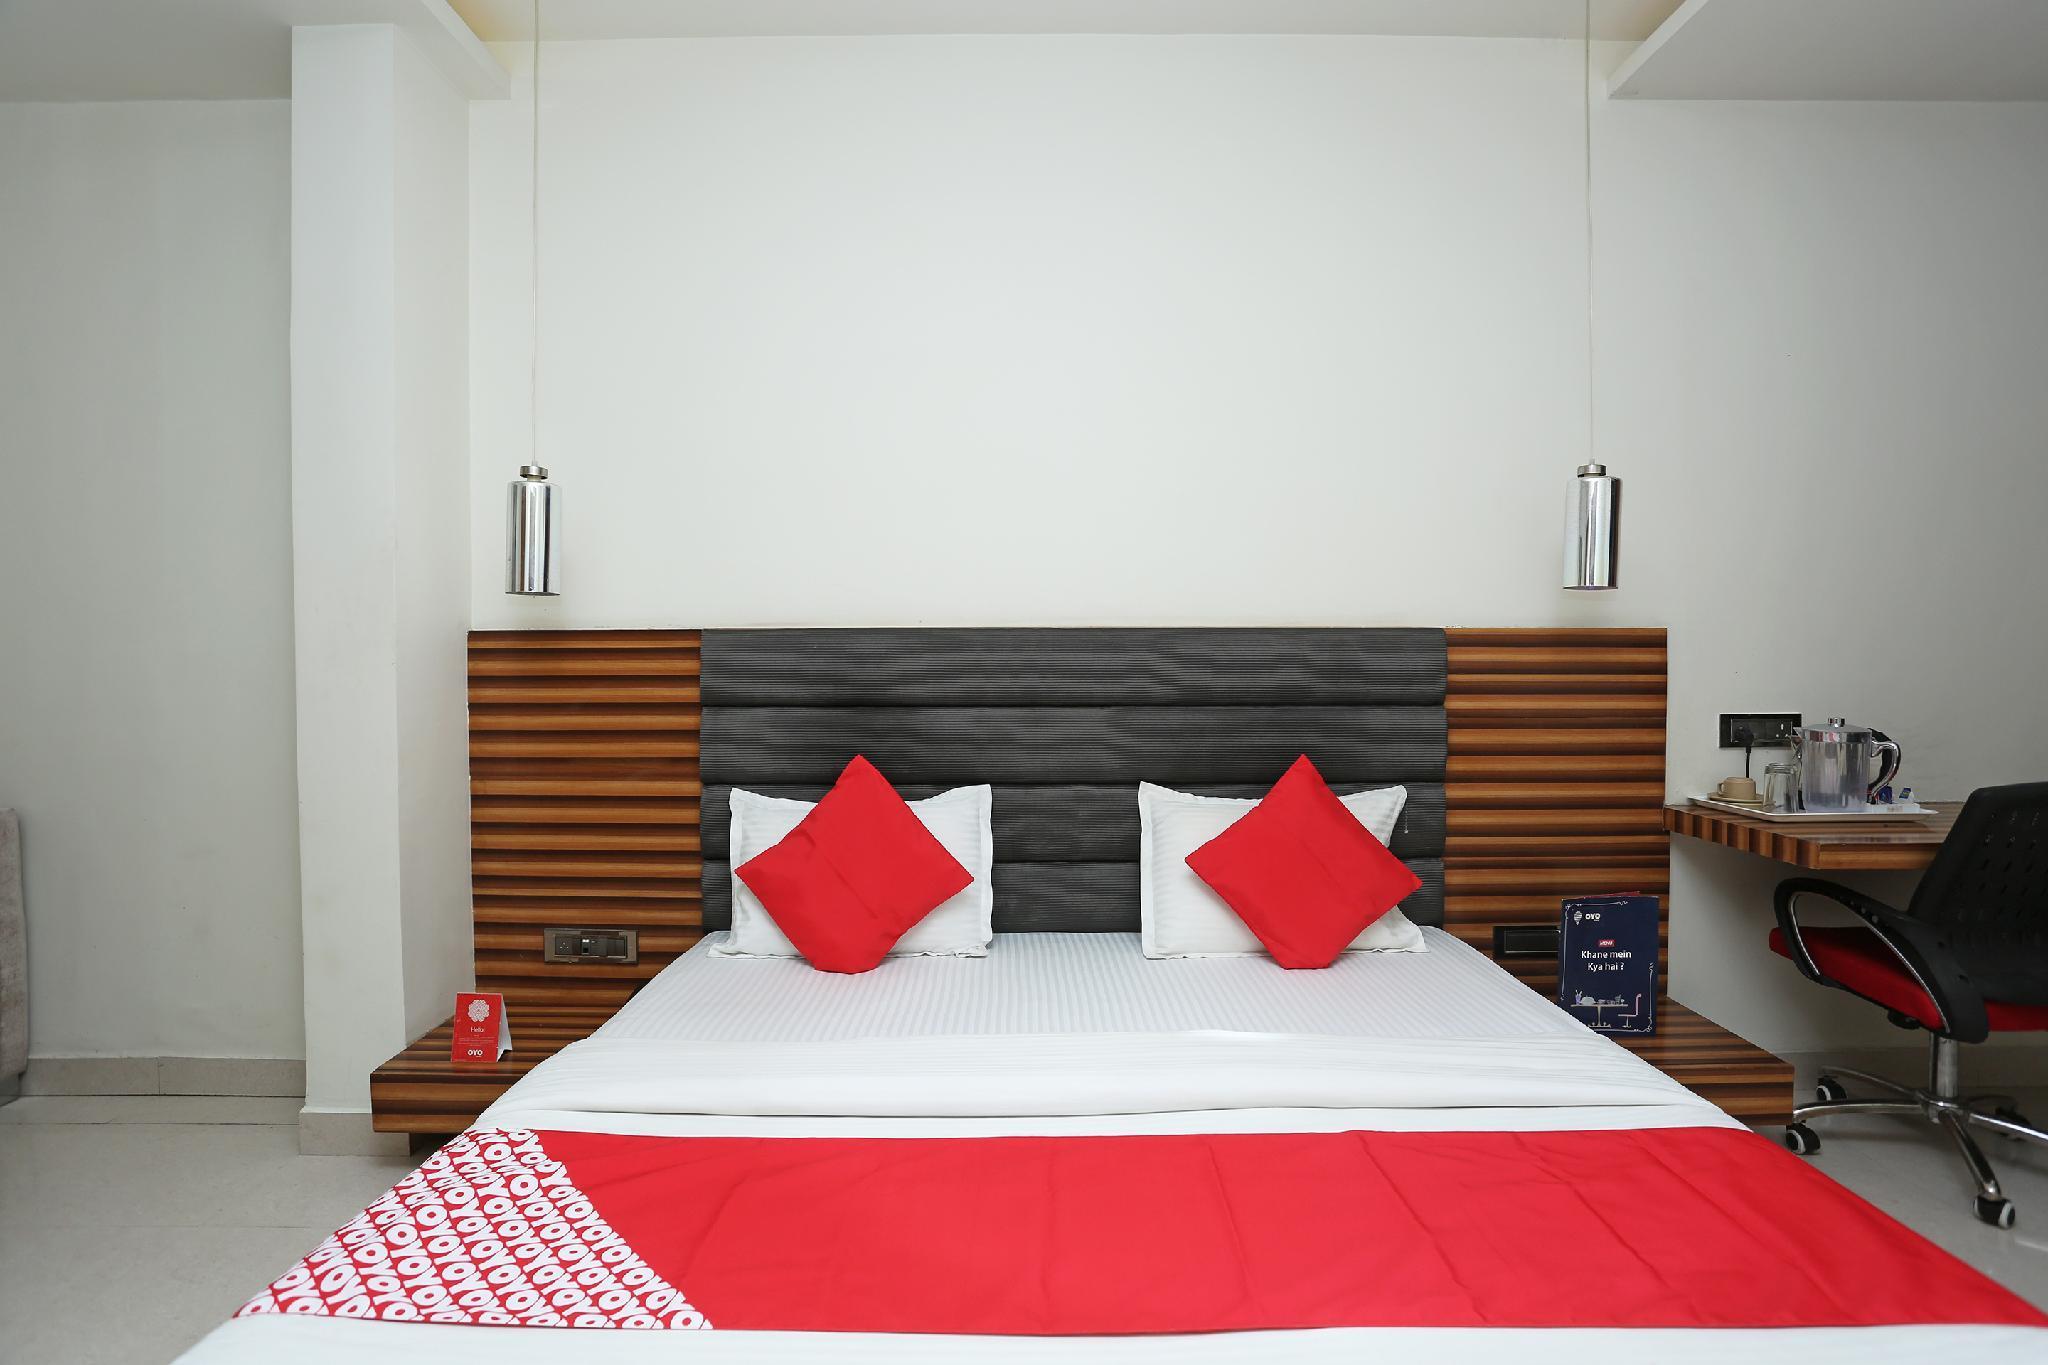 3dbf51475179d8 OYO 8183 Hotel Sandal Wood, Bhopal, India - Photos, Room Rates ...